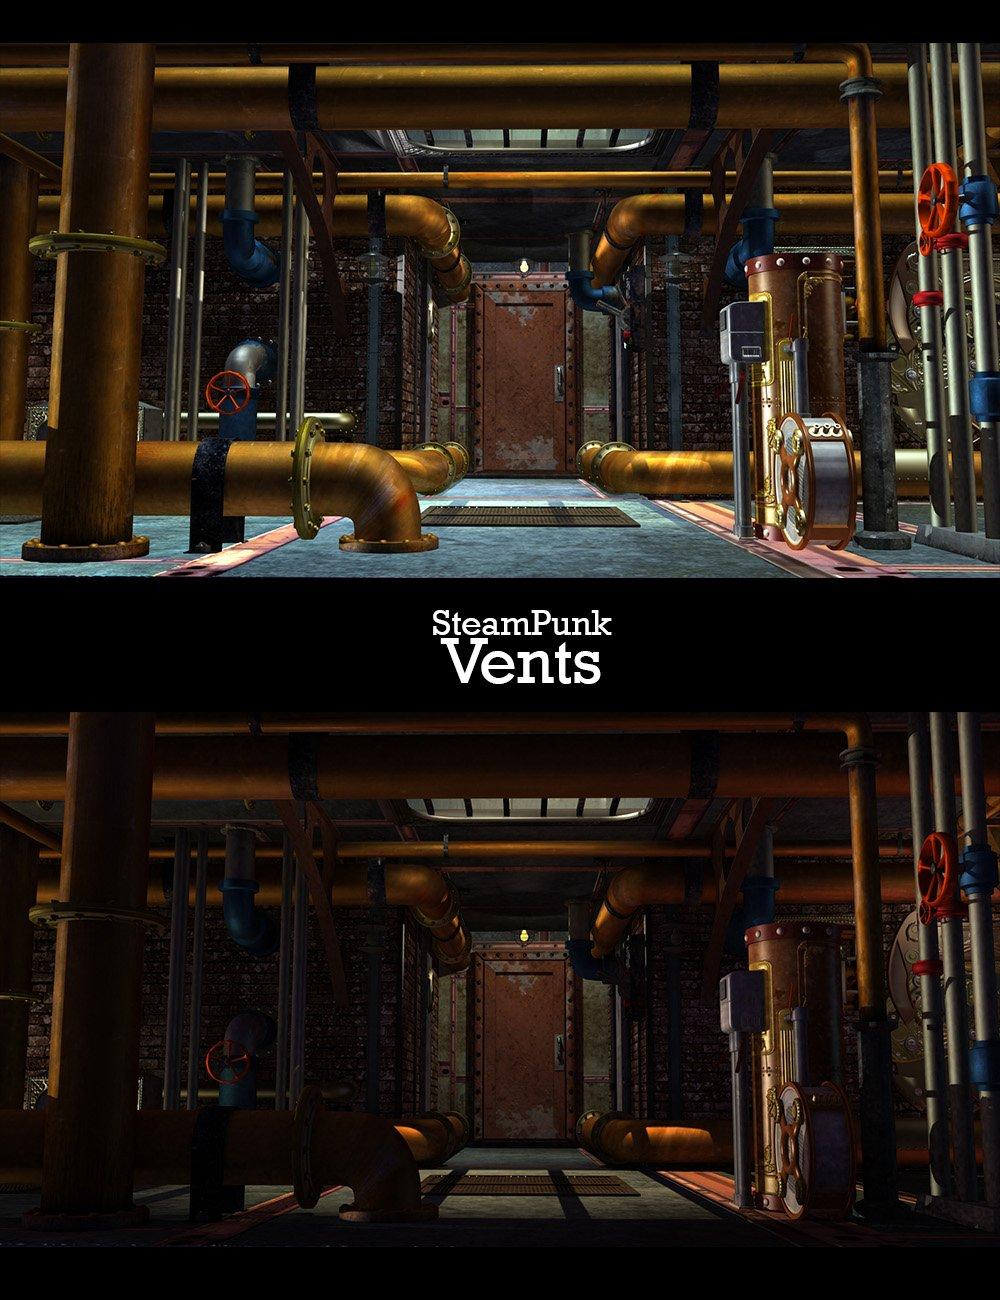 SteamPunk - Vents by: Phantasmagorical Scenes, 3D Models by Daz 3D